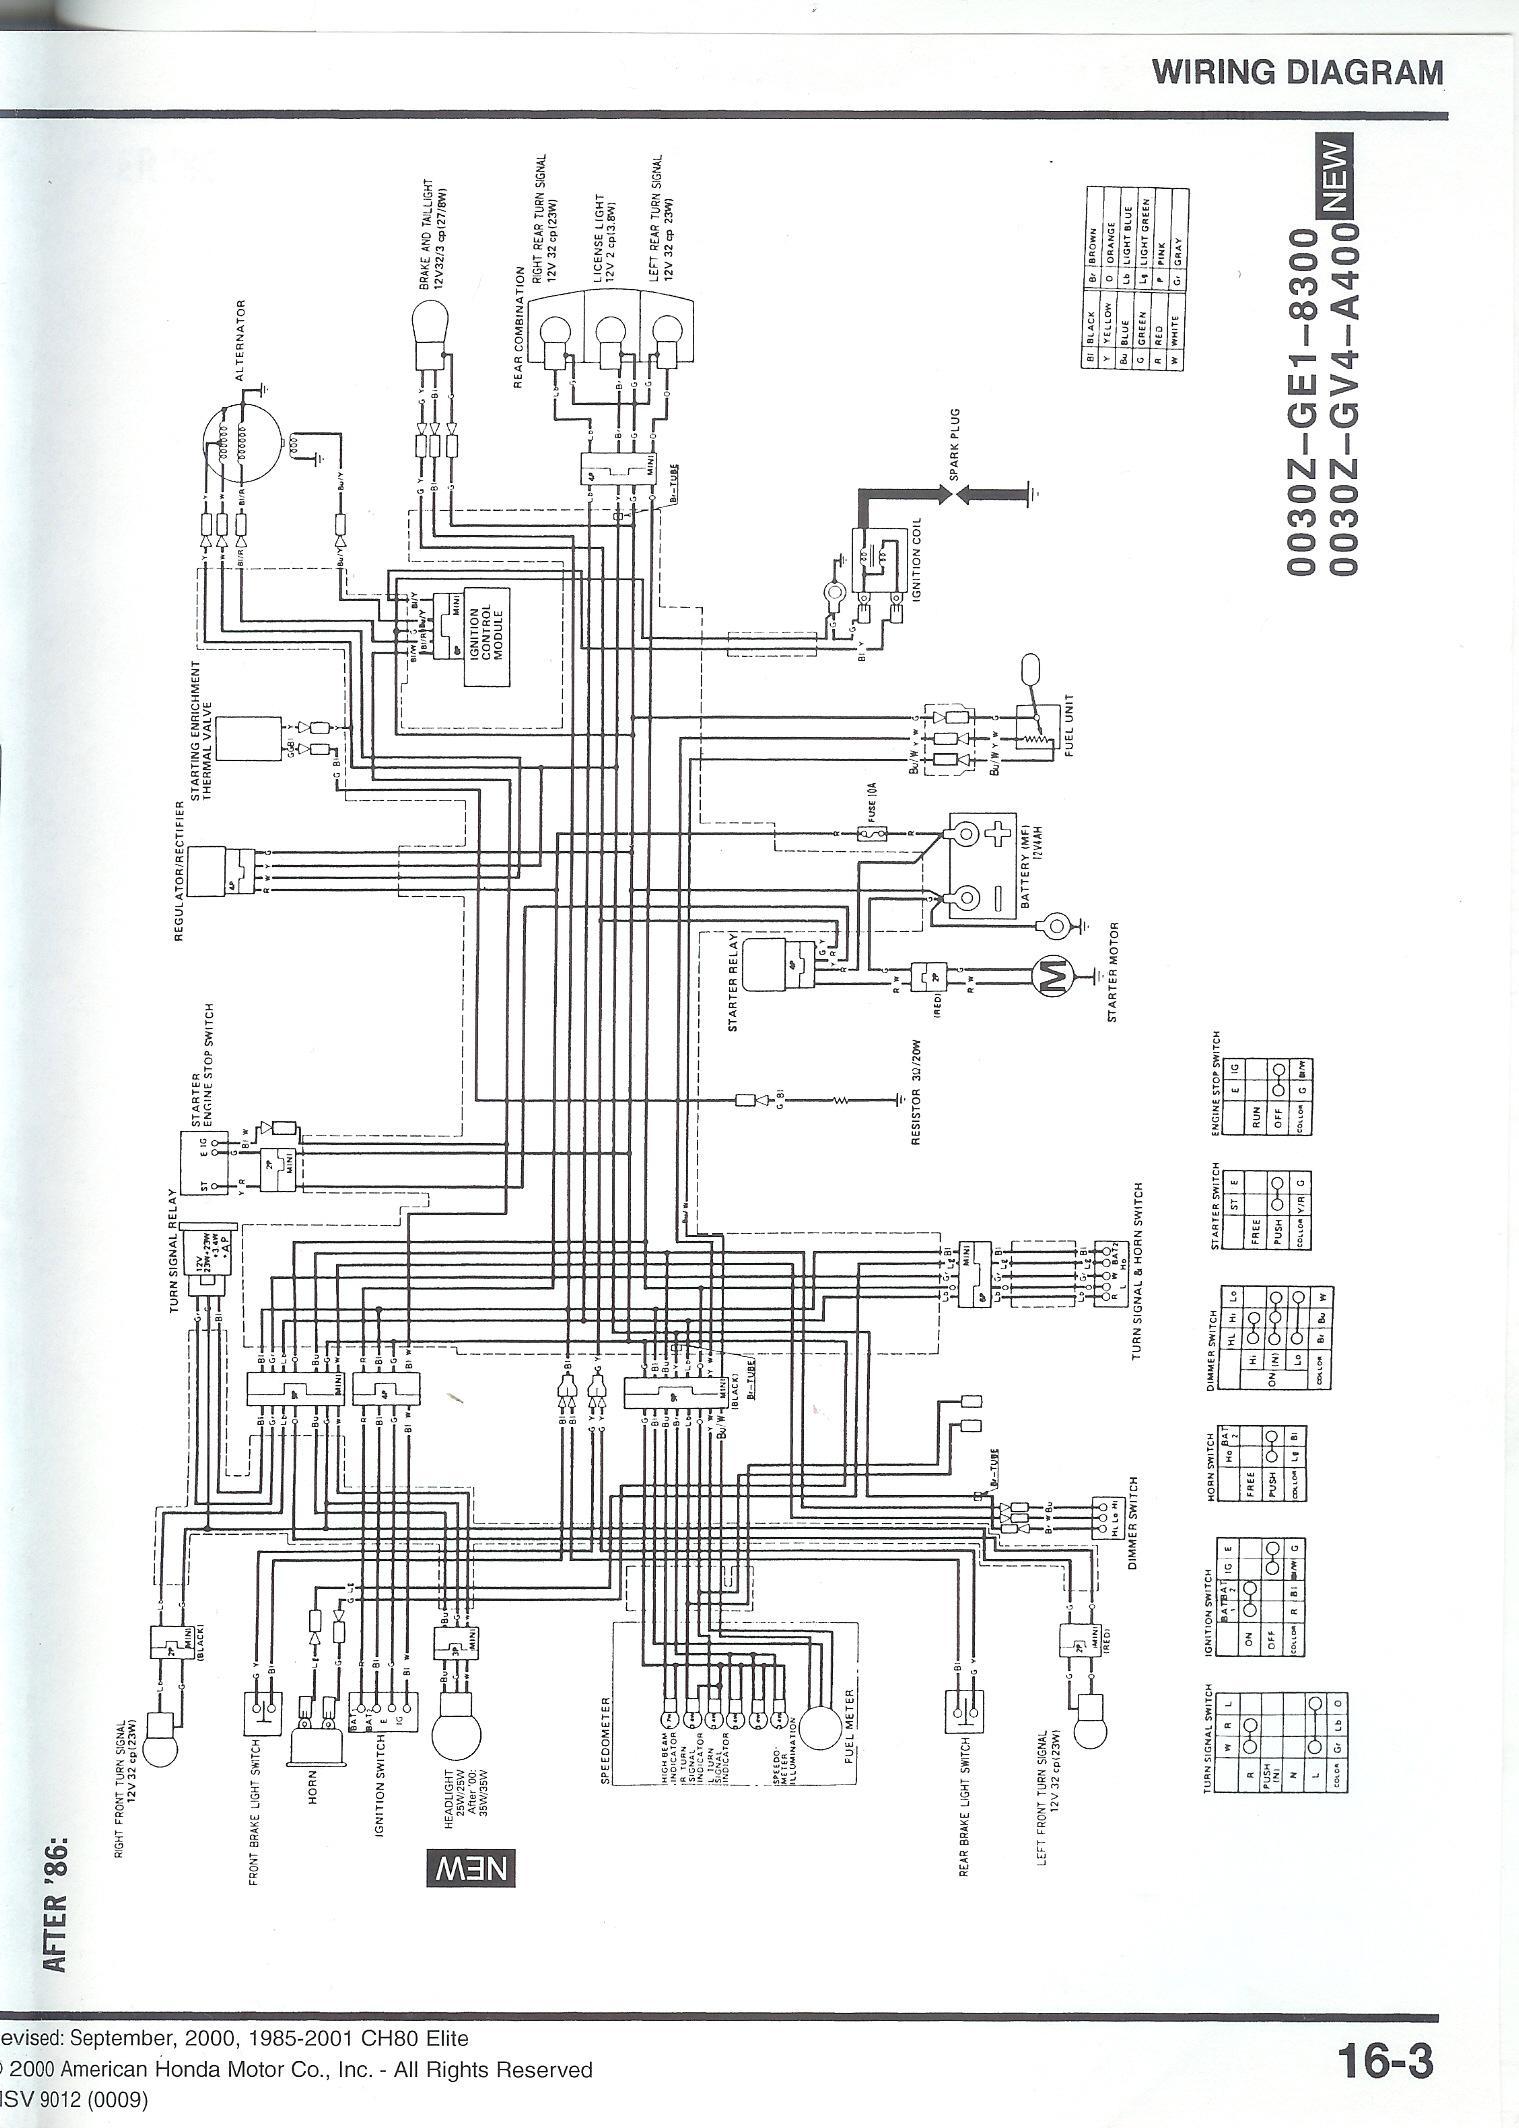 1994 Honda Elite 80 Wiring Diagram Auto Electrical